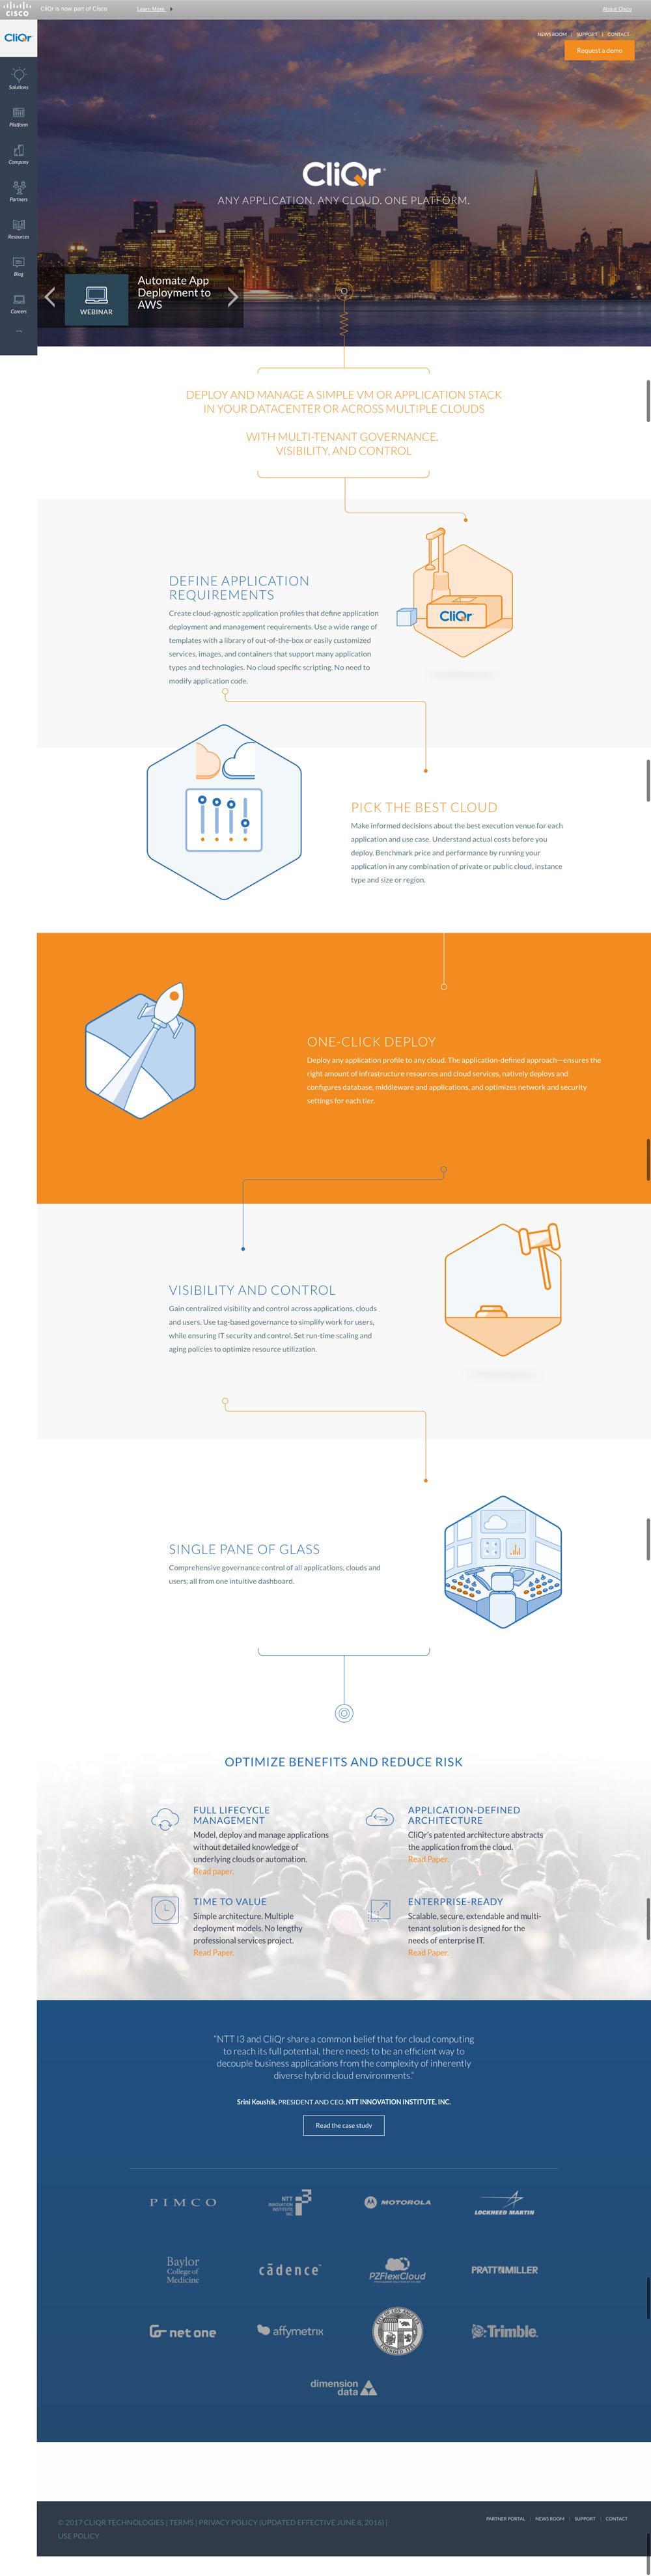 Cliqr Website Design